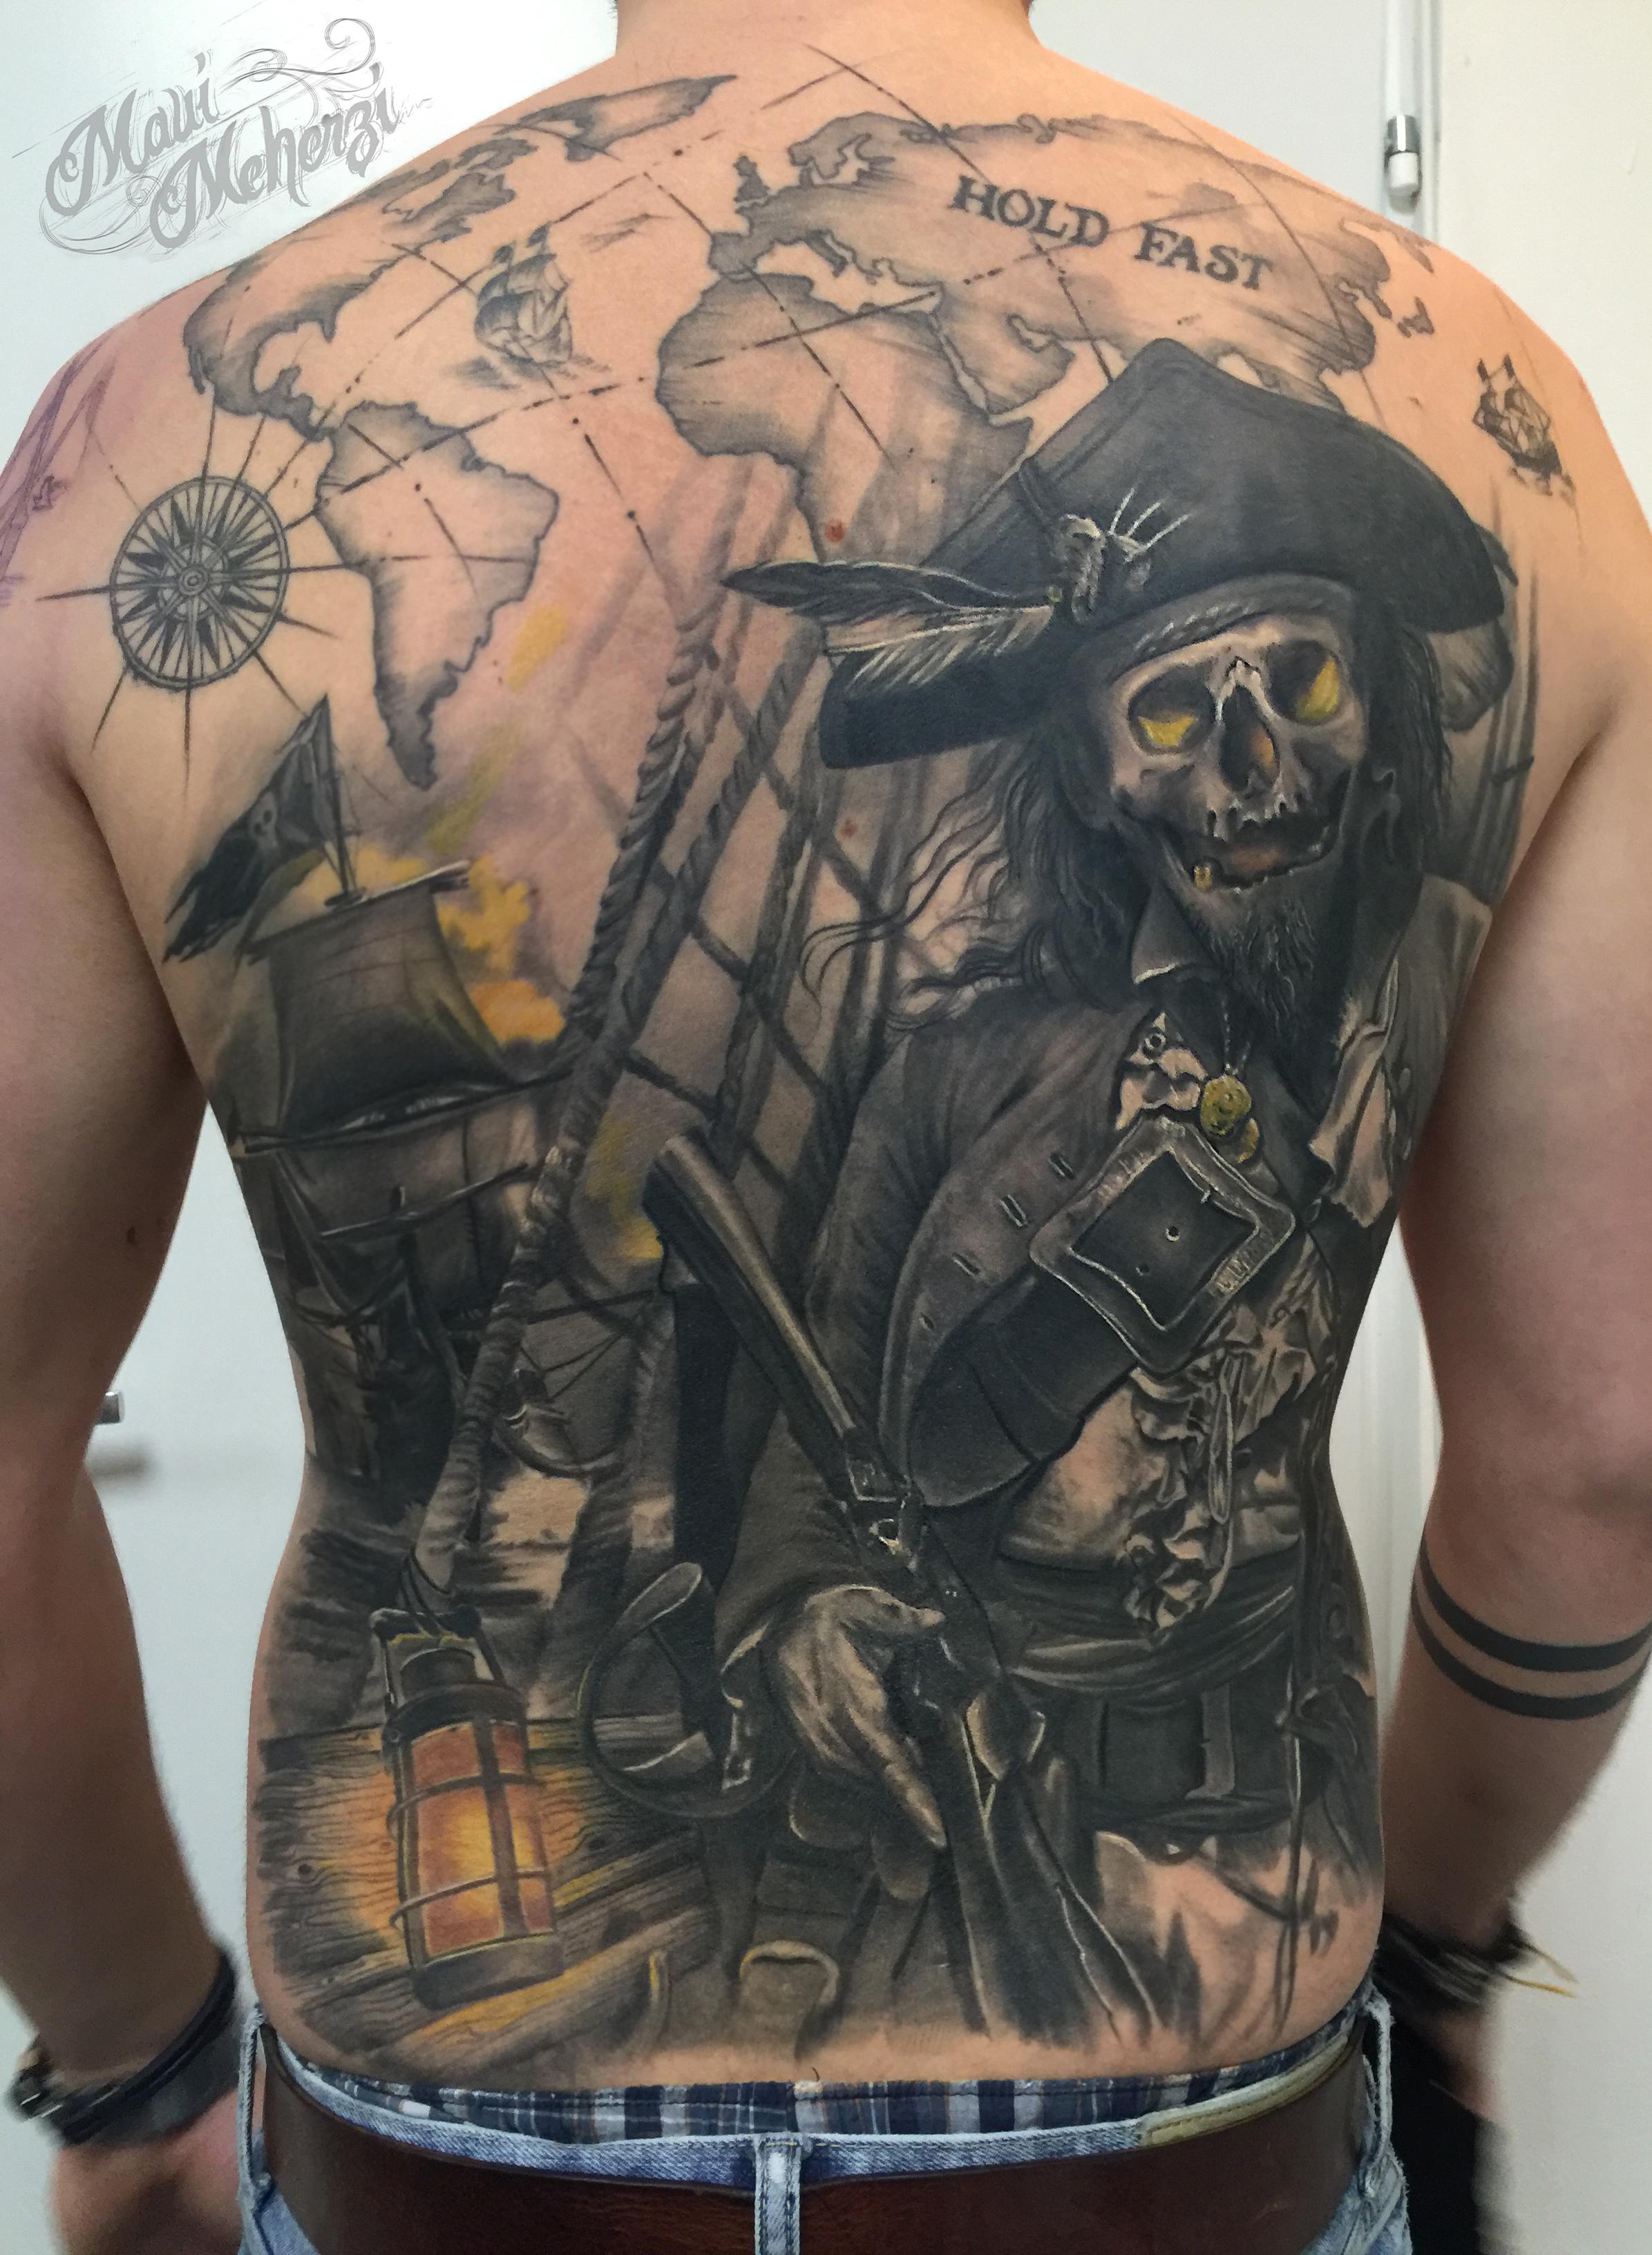 Maui Meherzi - Opus Magnum Tattoo Studio Wien - Sailor Ship Pirate Back Tattoo Healed